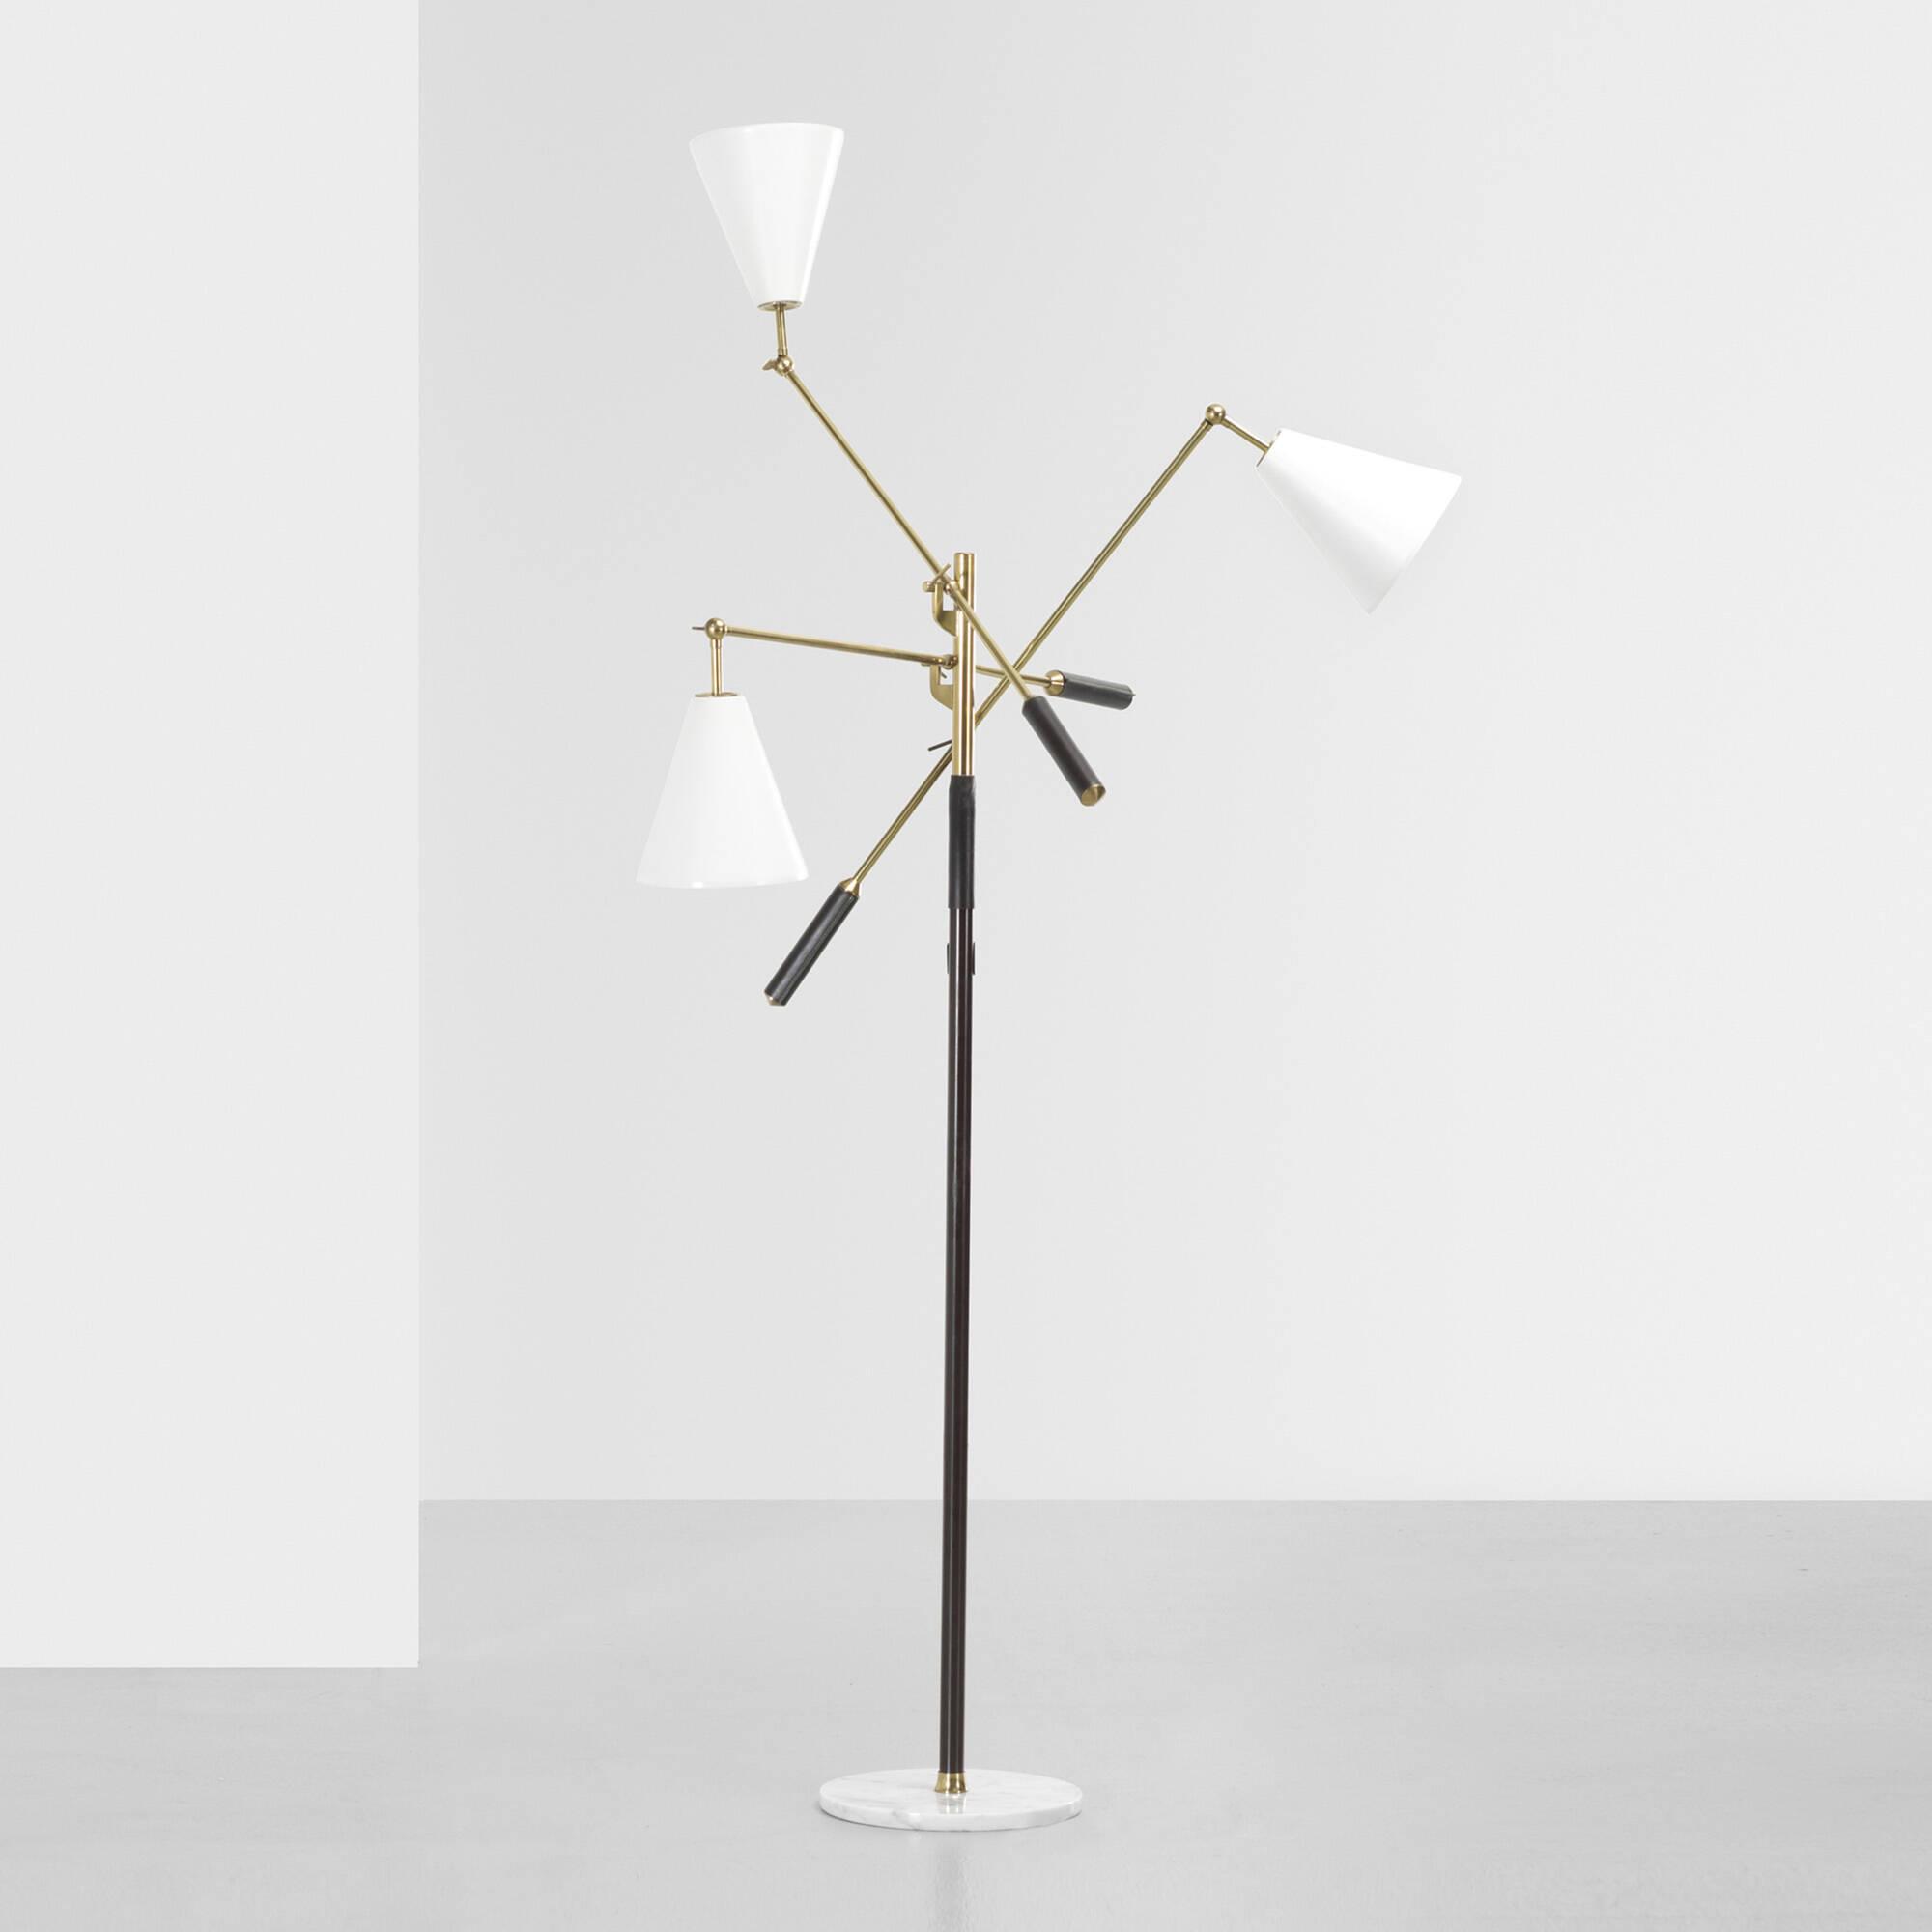 161 arredoluce three arm floor lamp for Arredo luce